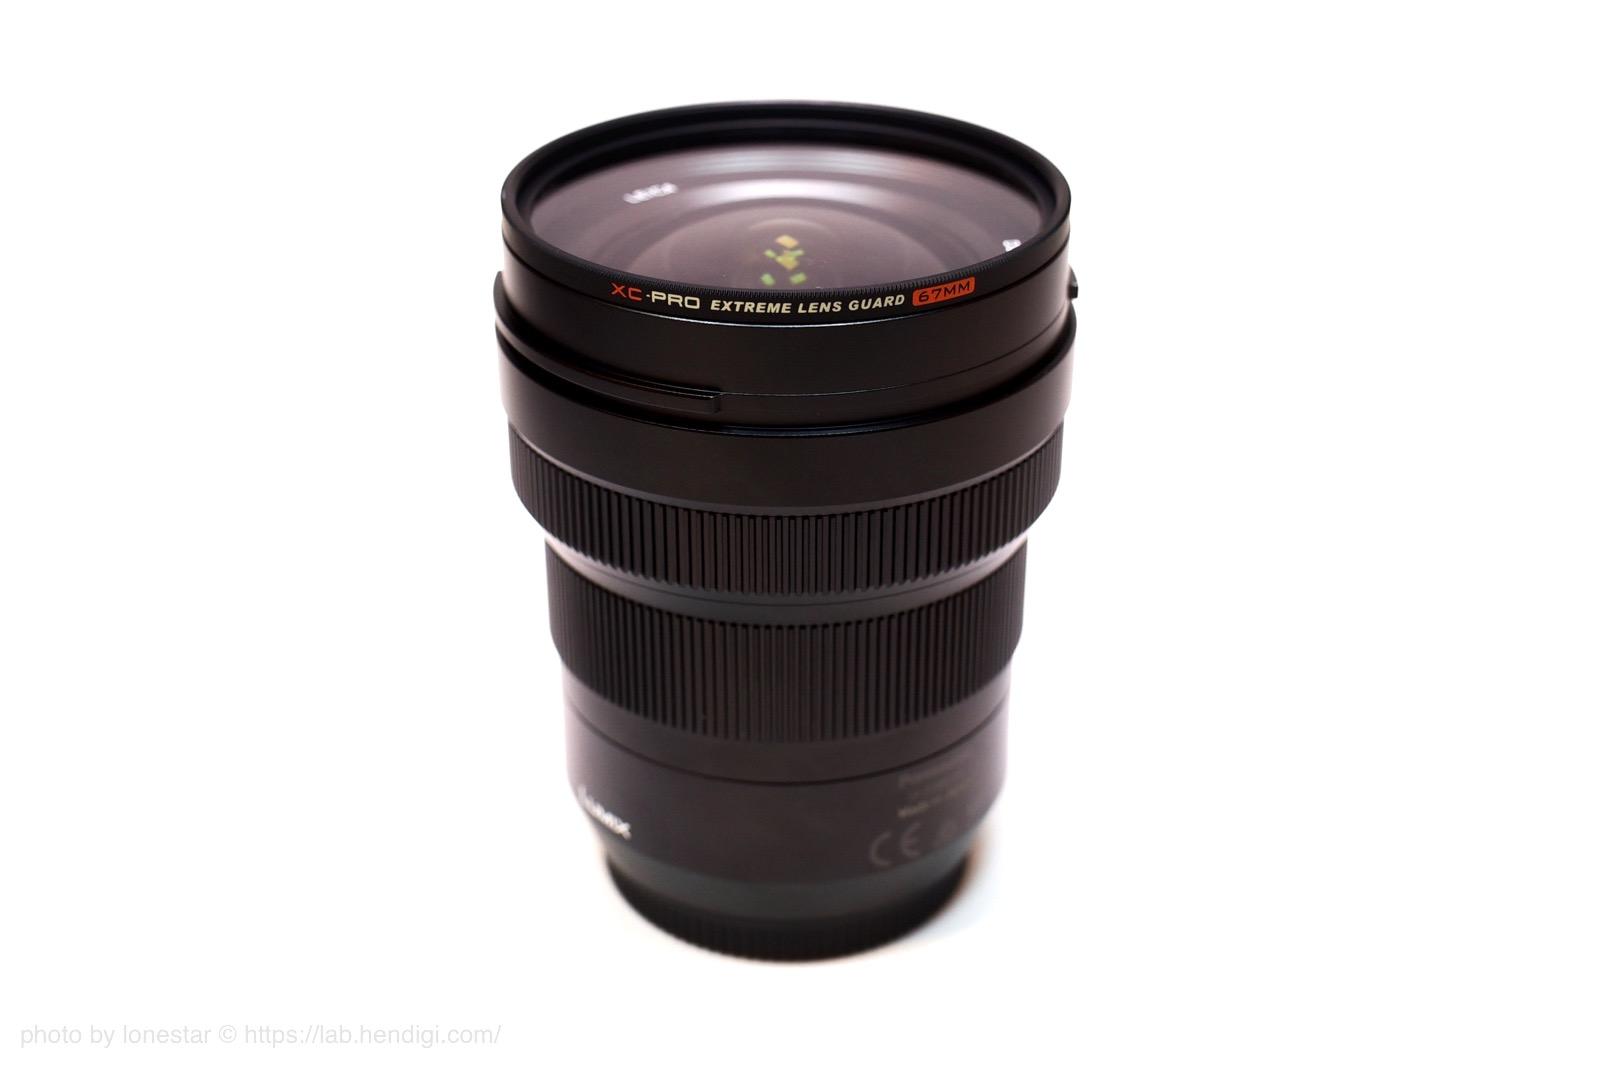 Panasonic LEICA DG VARIO-ELMARIT 8-18mm / F2.8-4.0 ASPH. フィルター